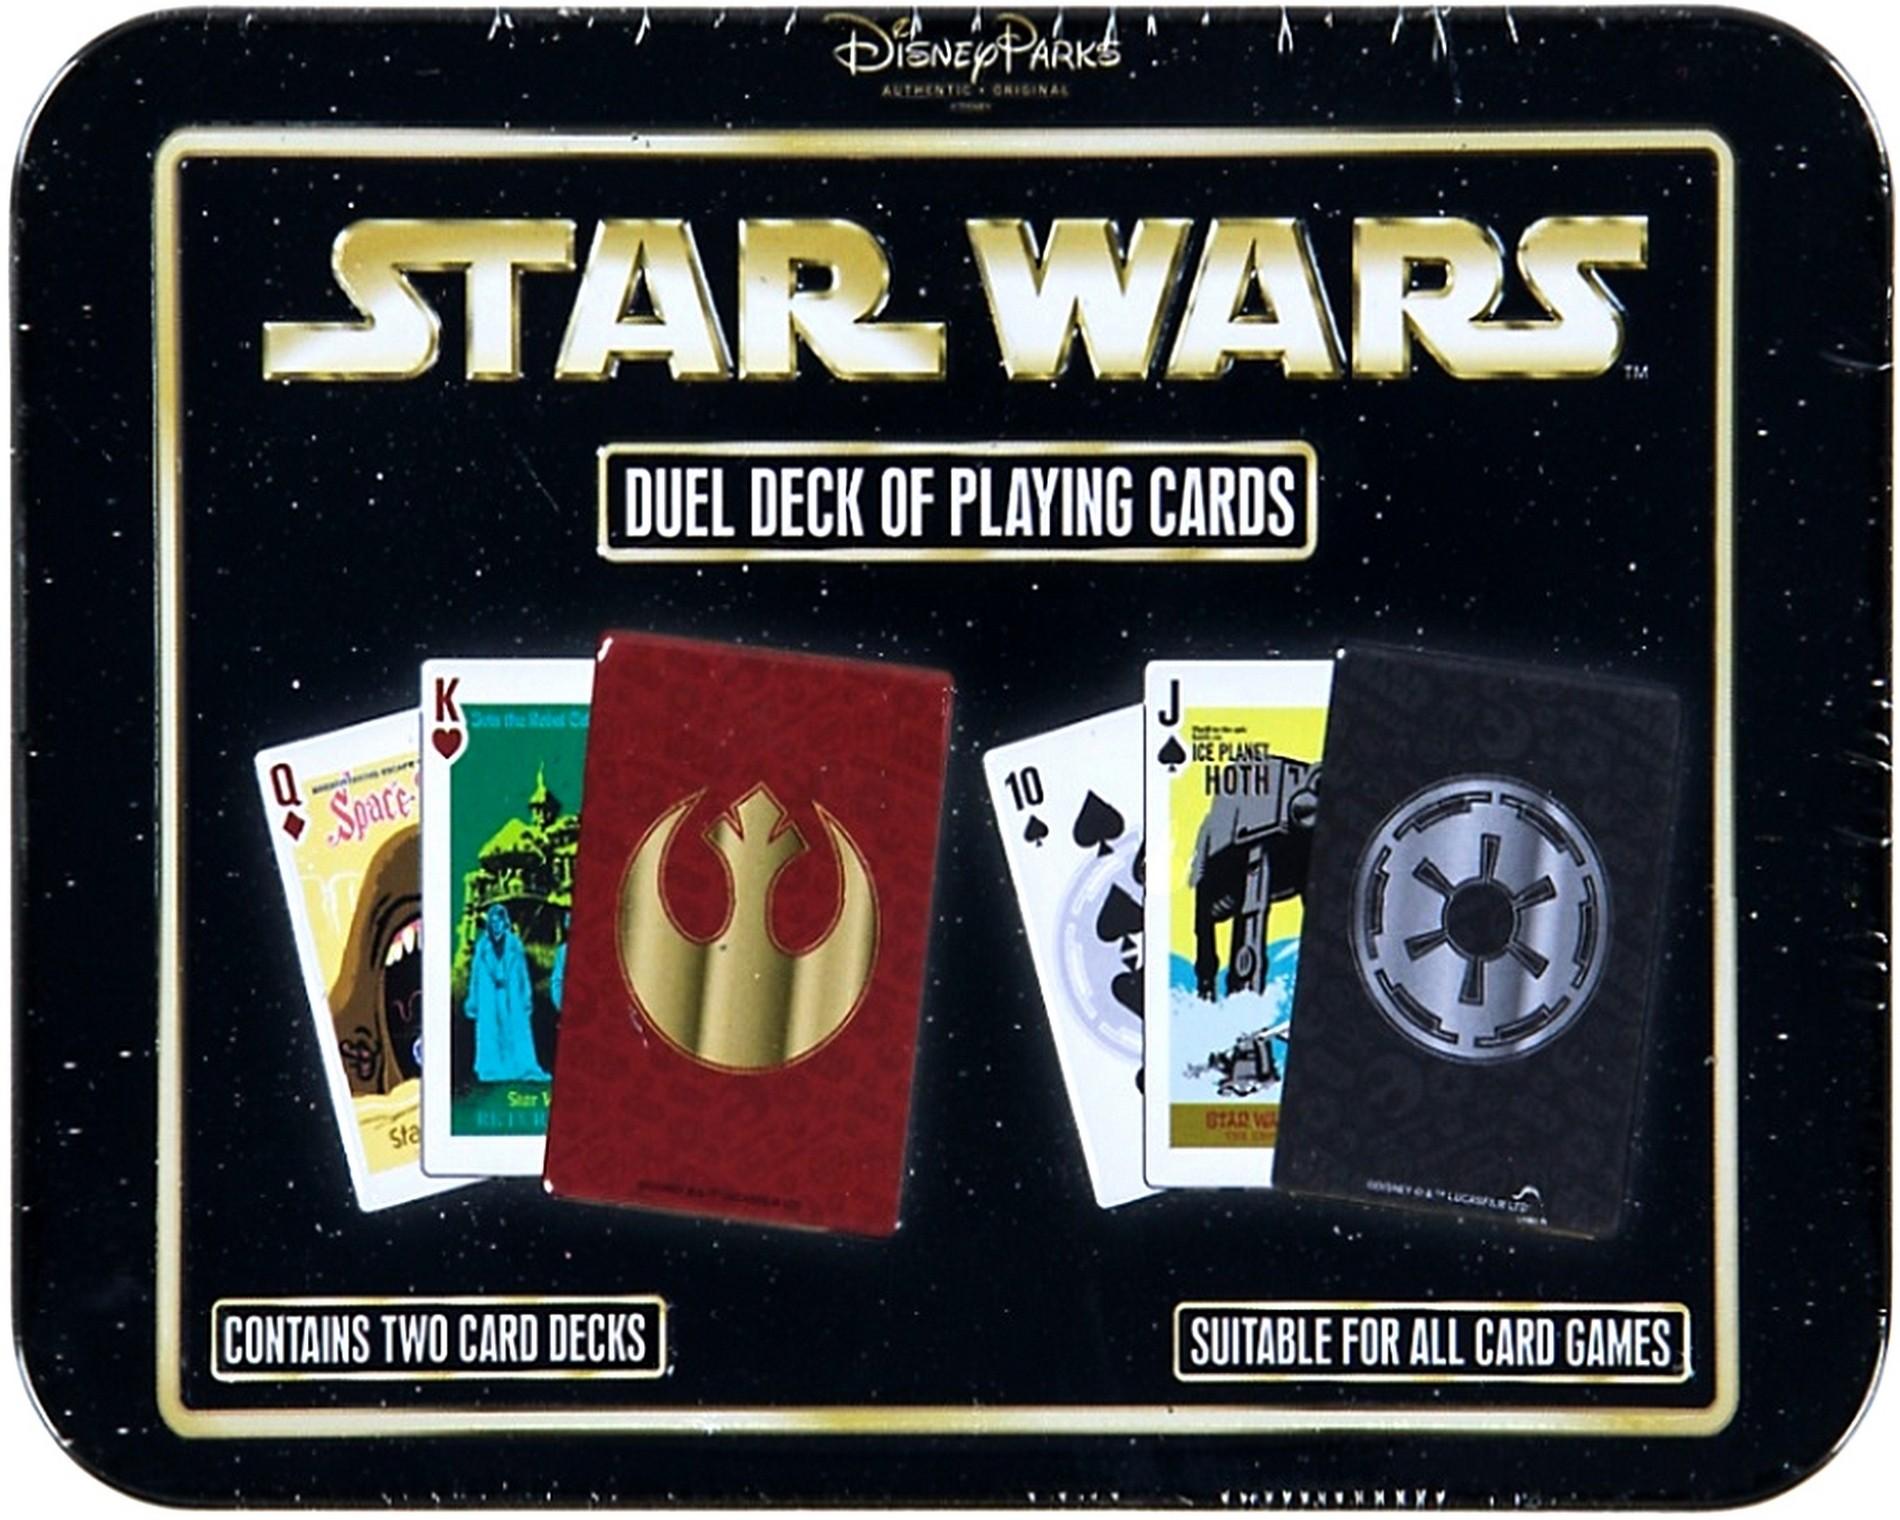 Disney's Star Wars - Duel Deck of Playing Cards © Dizdude.com